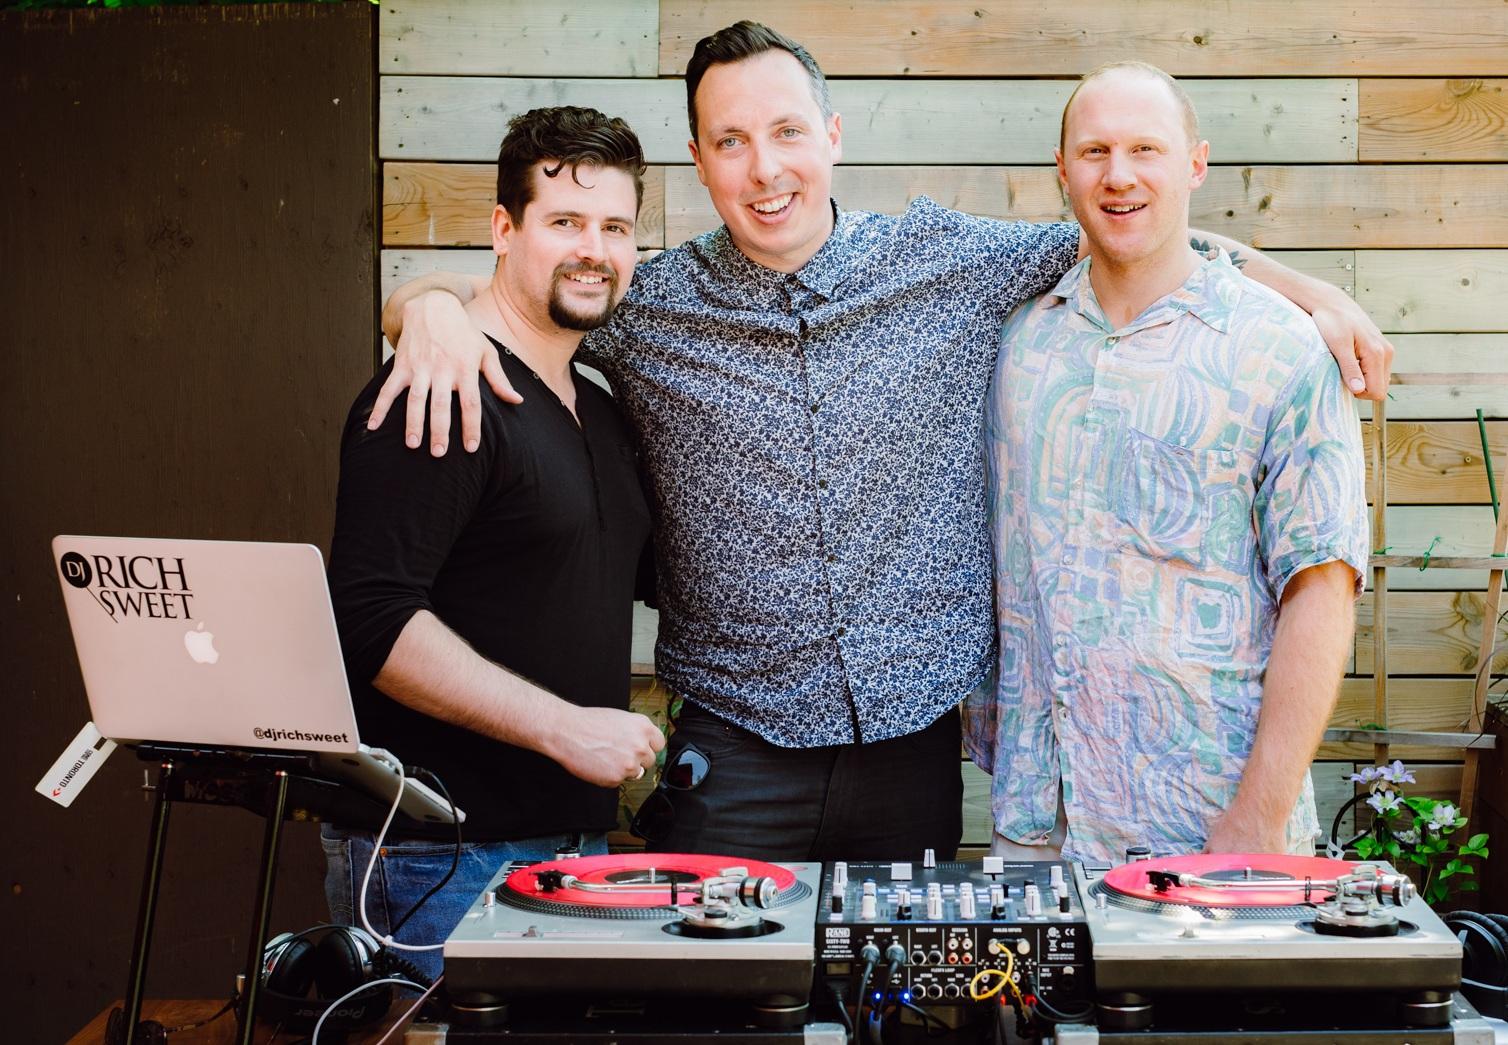 DJs Patty V, Rich Sweet & Trevor Kenny, photo by Becca Gilgan